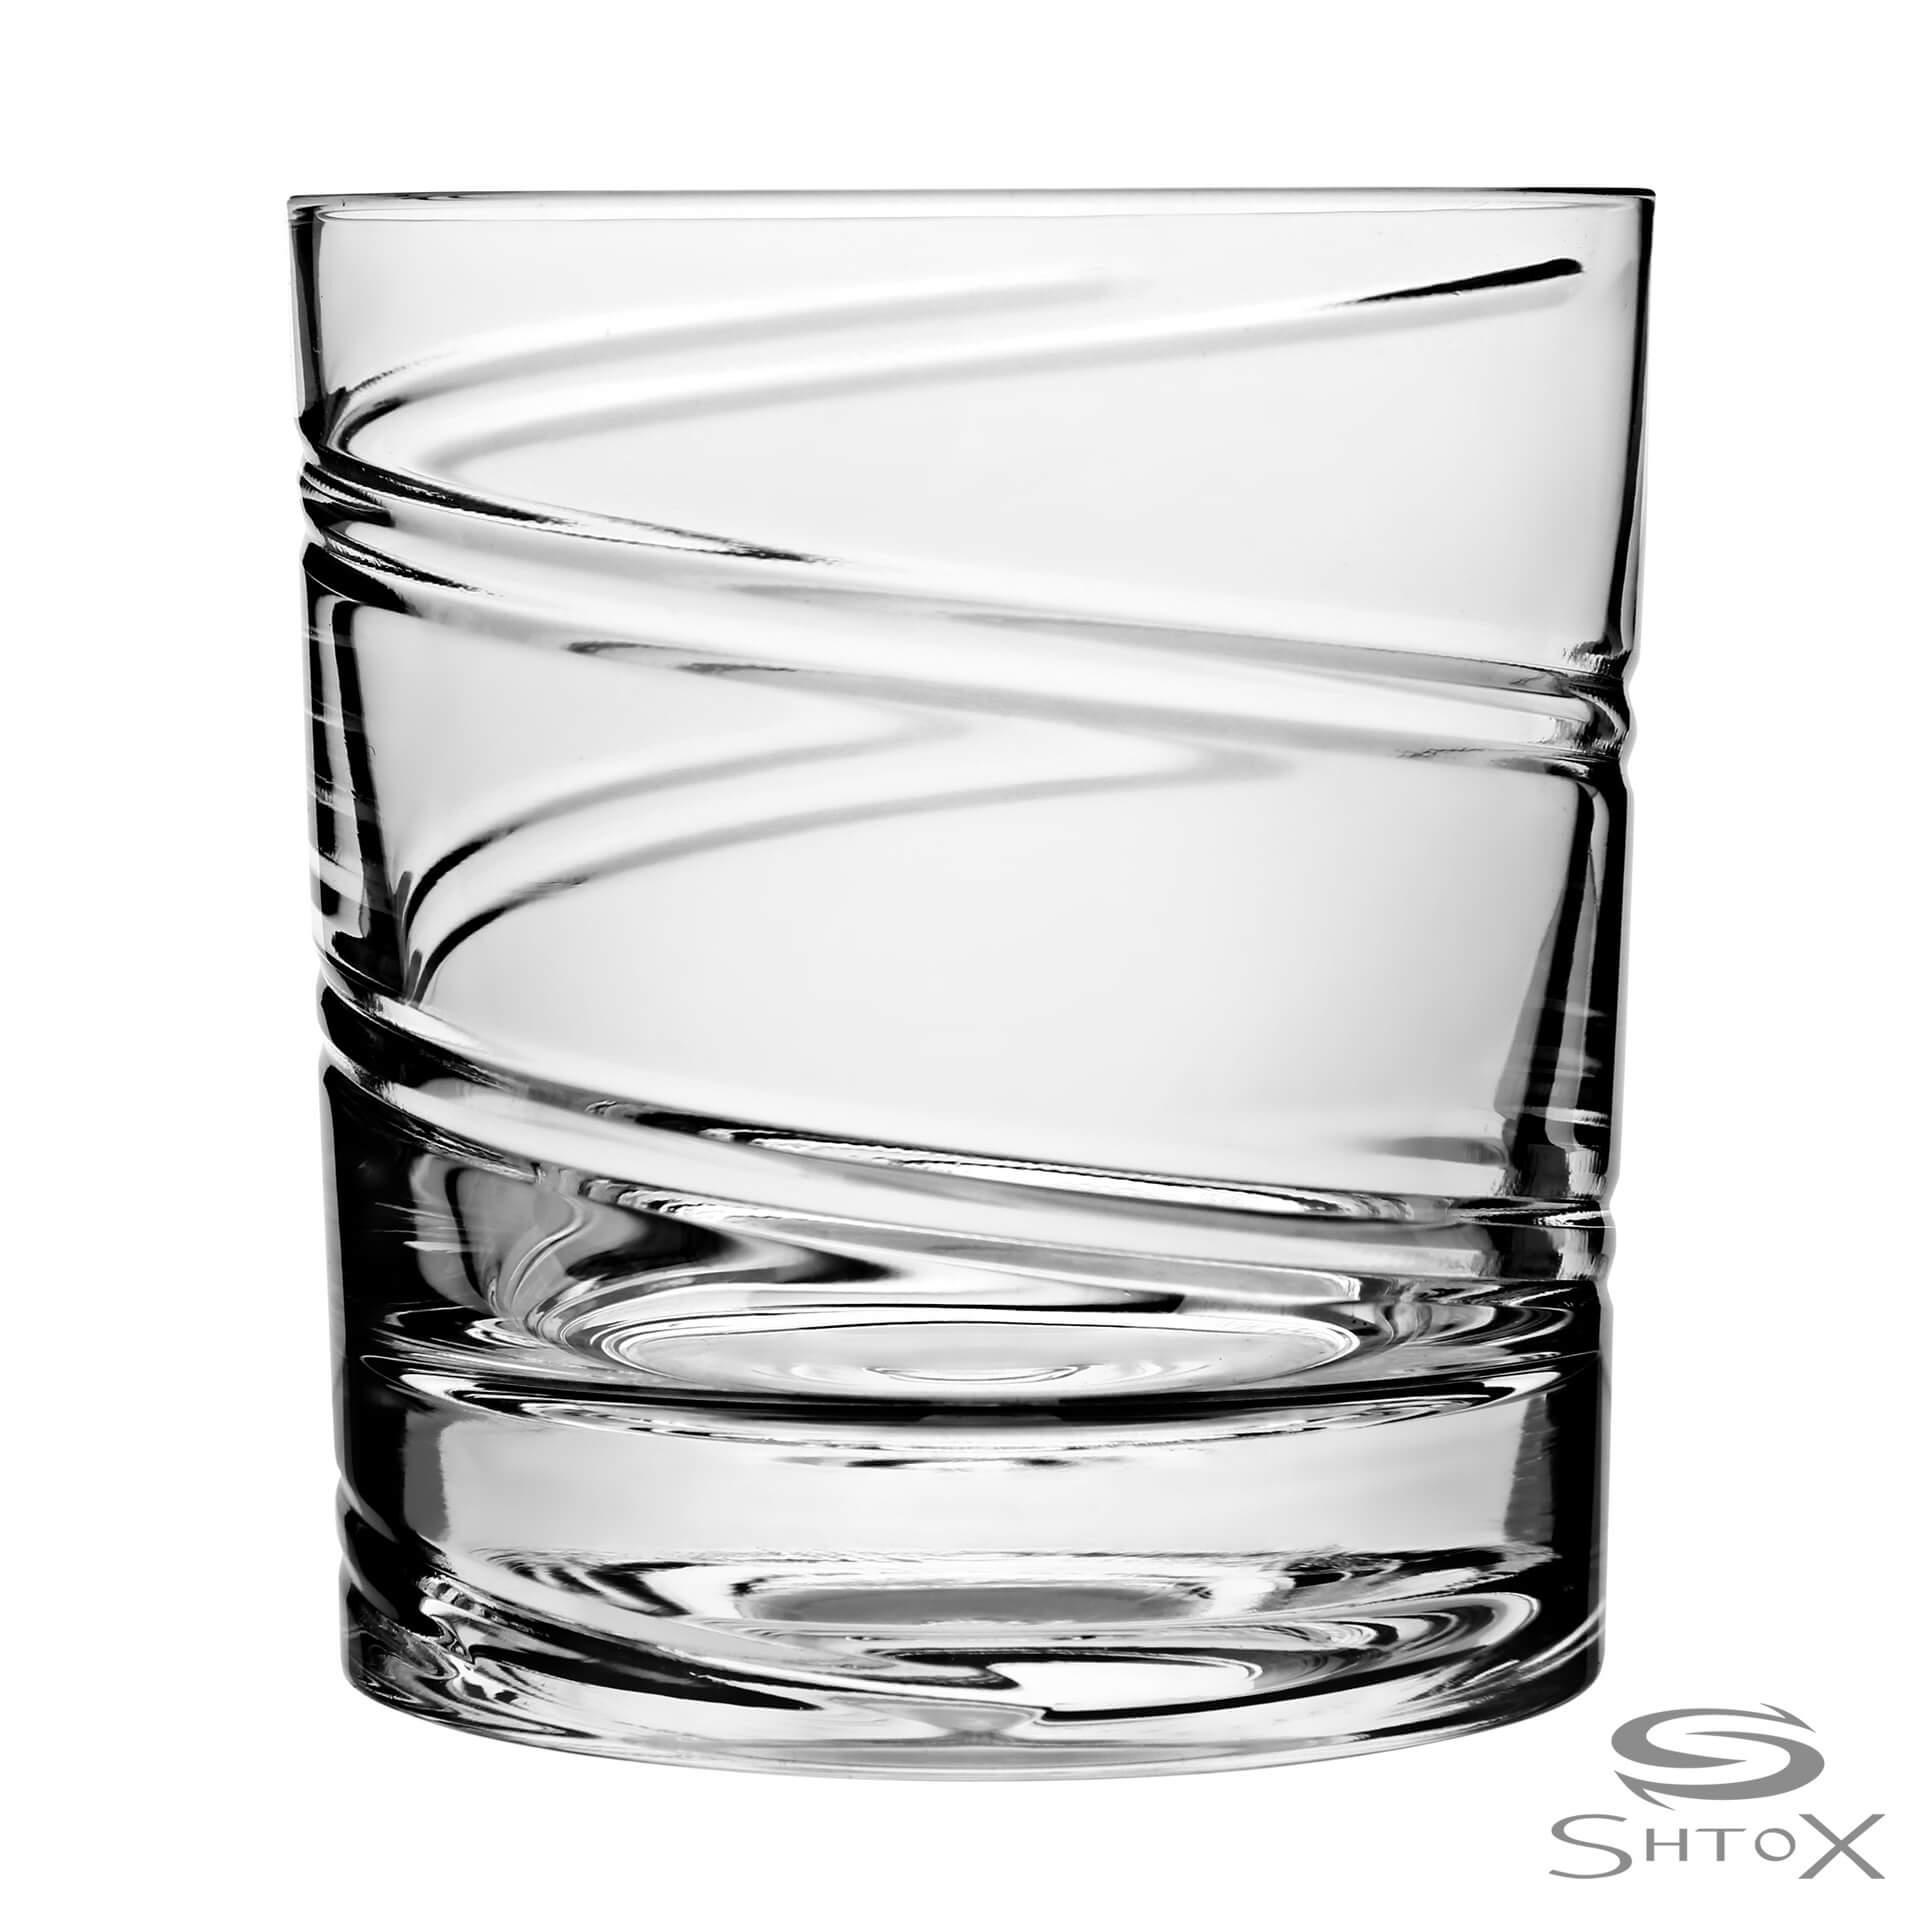 Rotating Glass Shtox 001